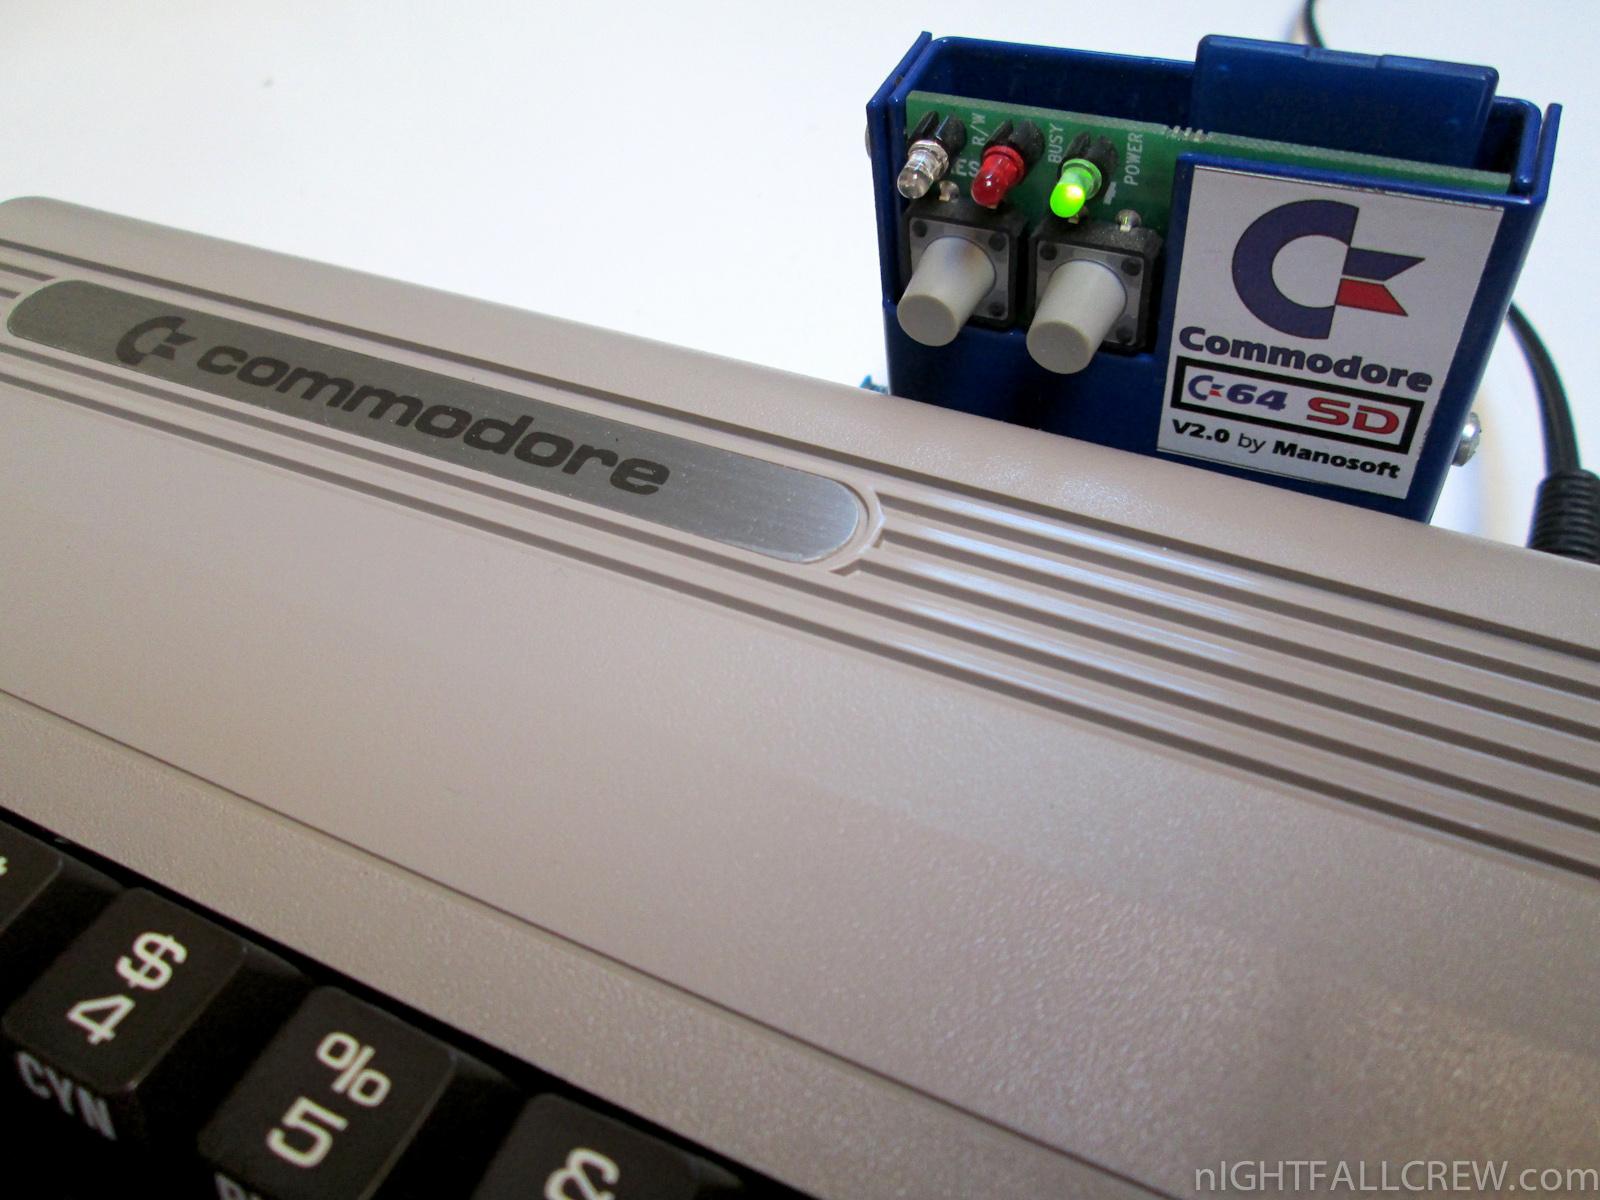 технологии второй половины 20 века: Commodore 64